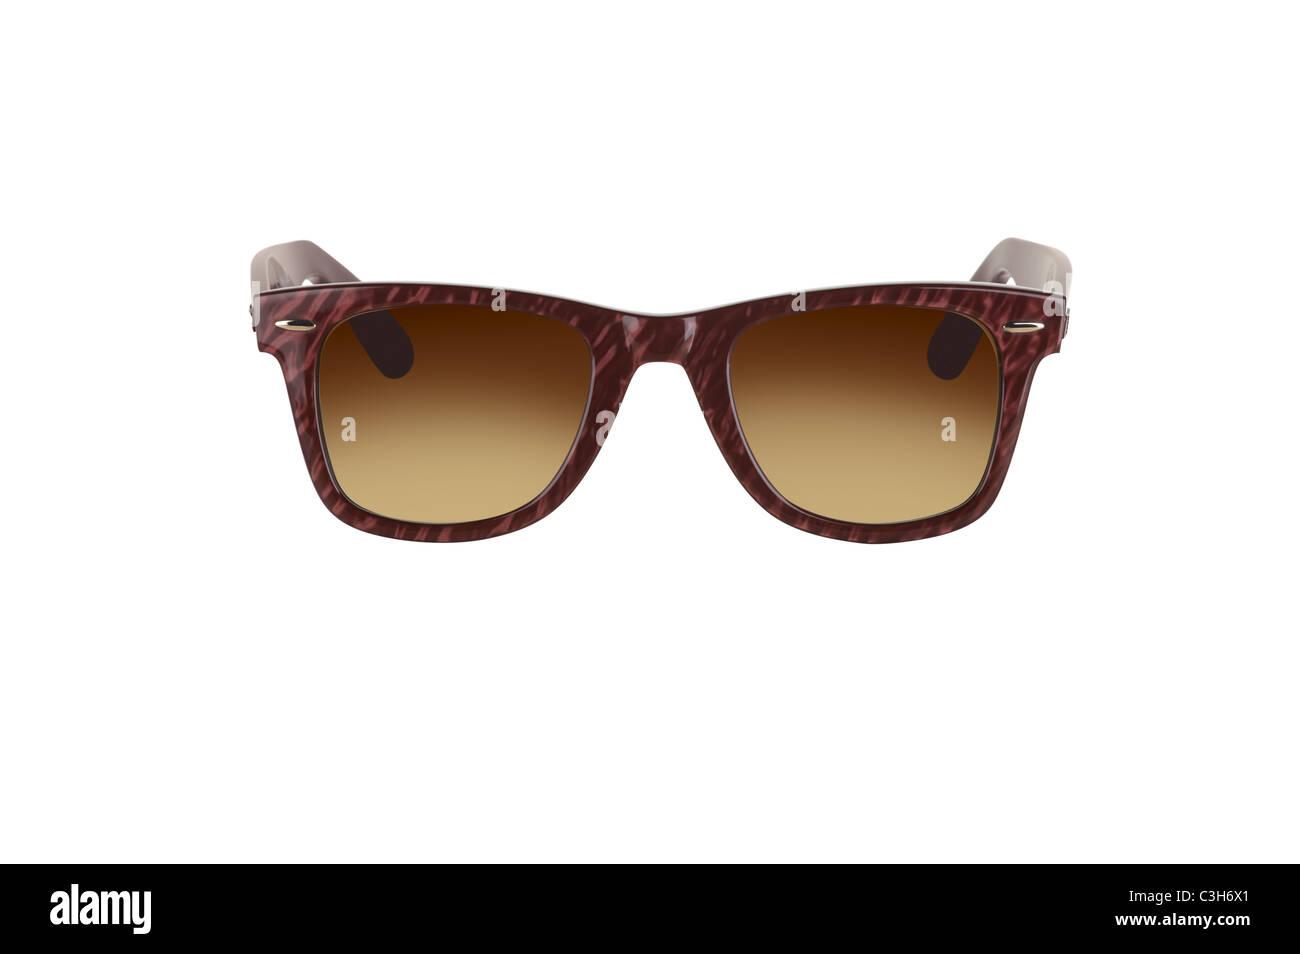 2b53903a4ca Glasses Goggles Sunglasses Stock Photos   Glasses Goggles Sunglasses ...